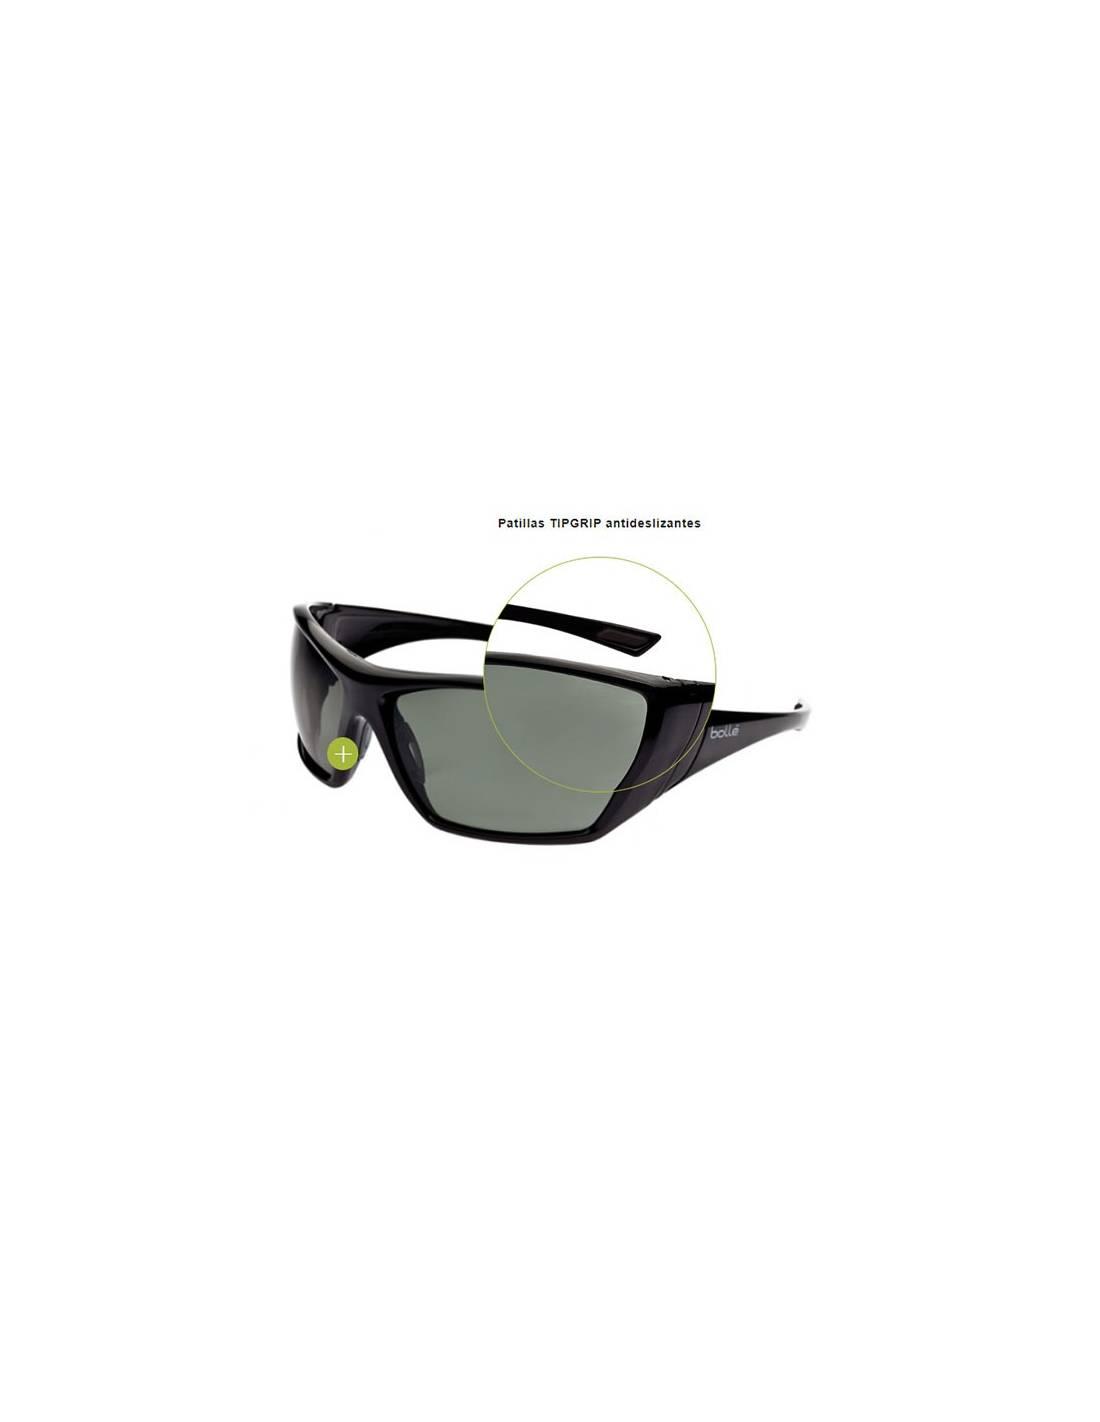 ab1ce51240 Gafas de sol de seguridad Hustler Bollé Polarizadas Anti impactos